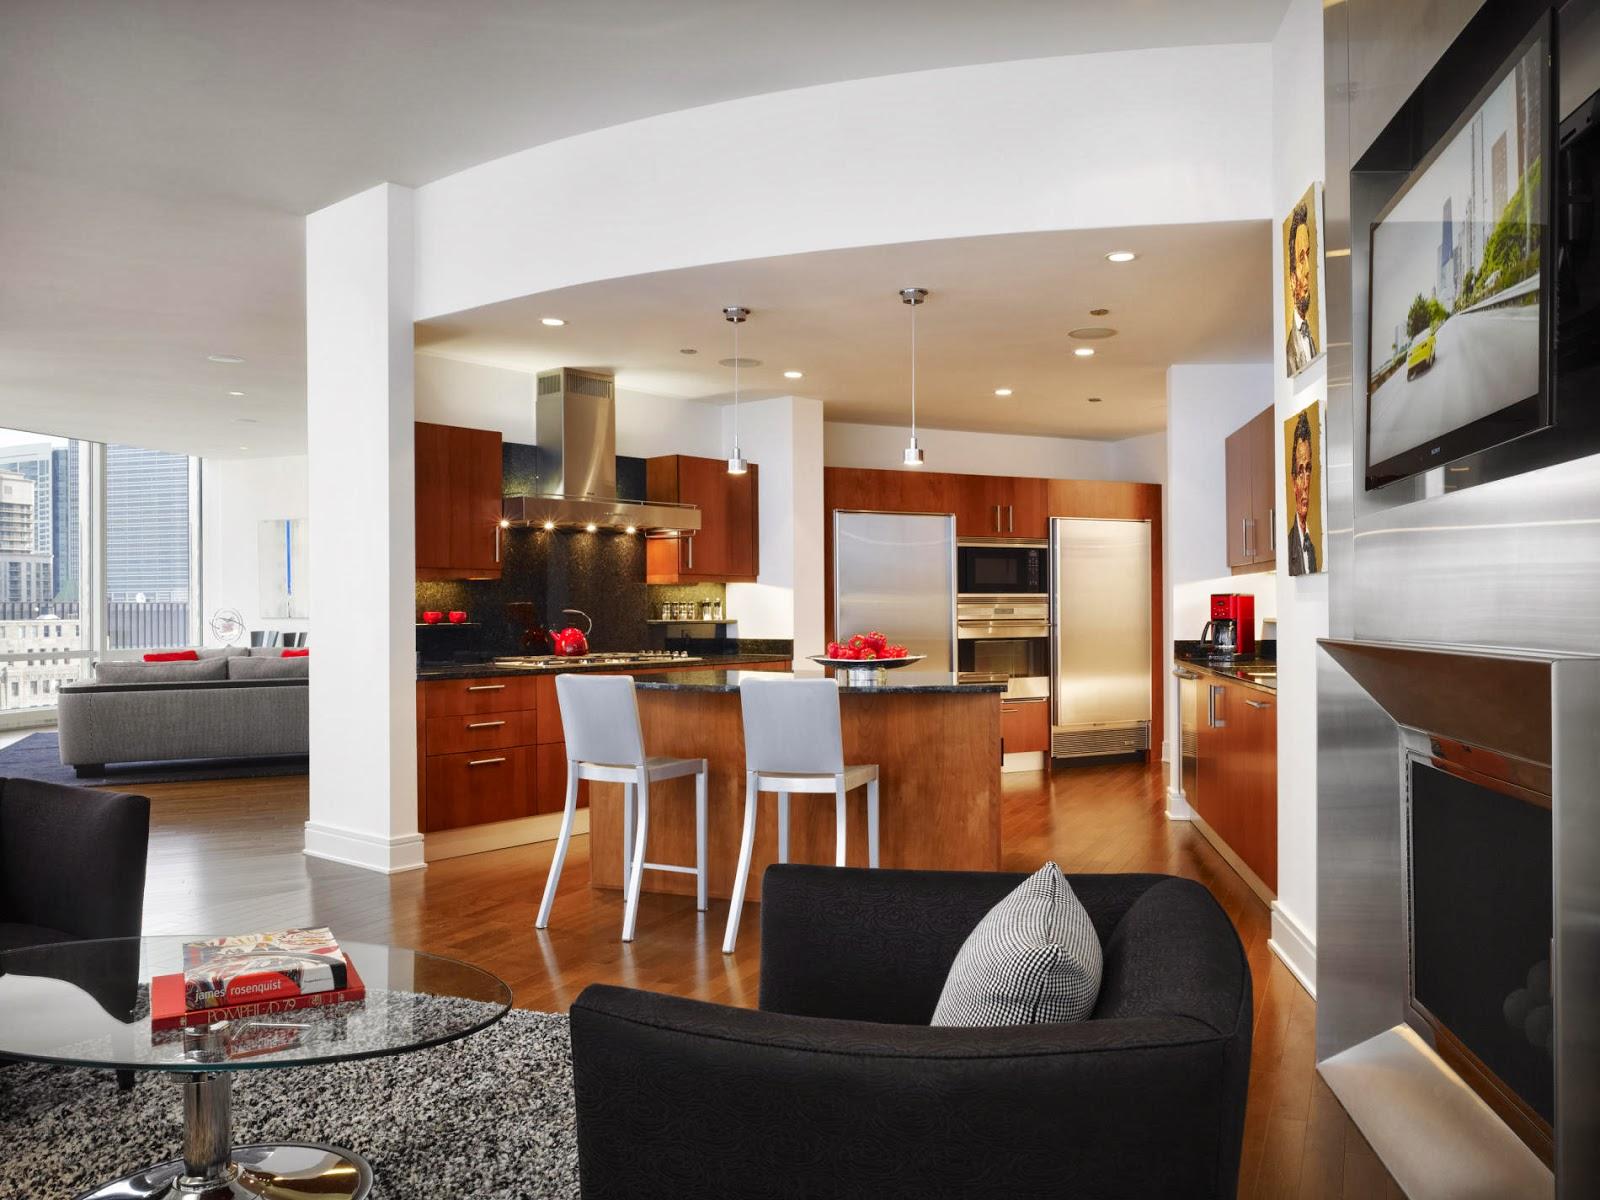 Interiornity Source Of Interior Design Ideas  Inspirational - Unique house interior design